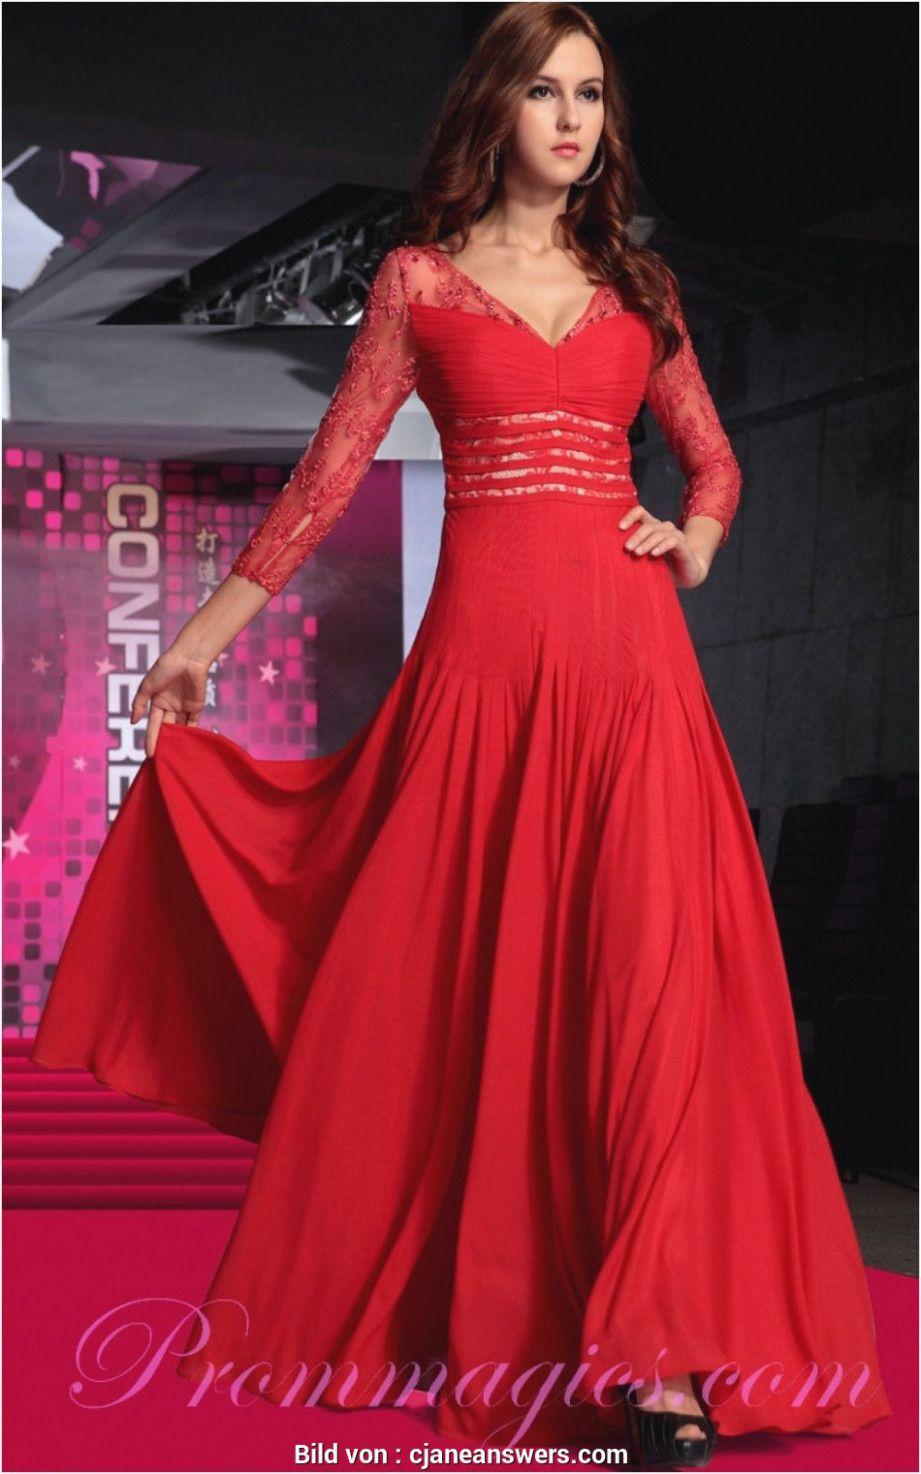 12 Abendkleider Otto in 12  Elegante rote kleider, Rote party